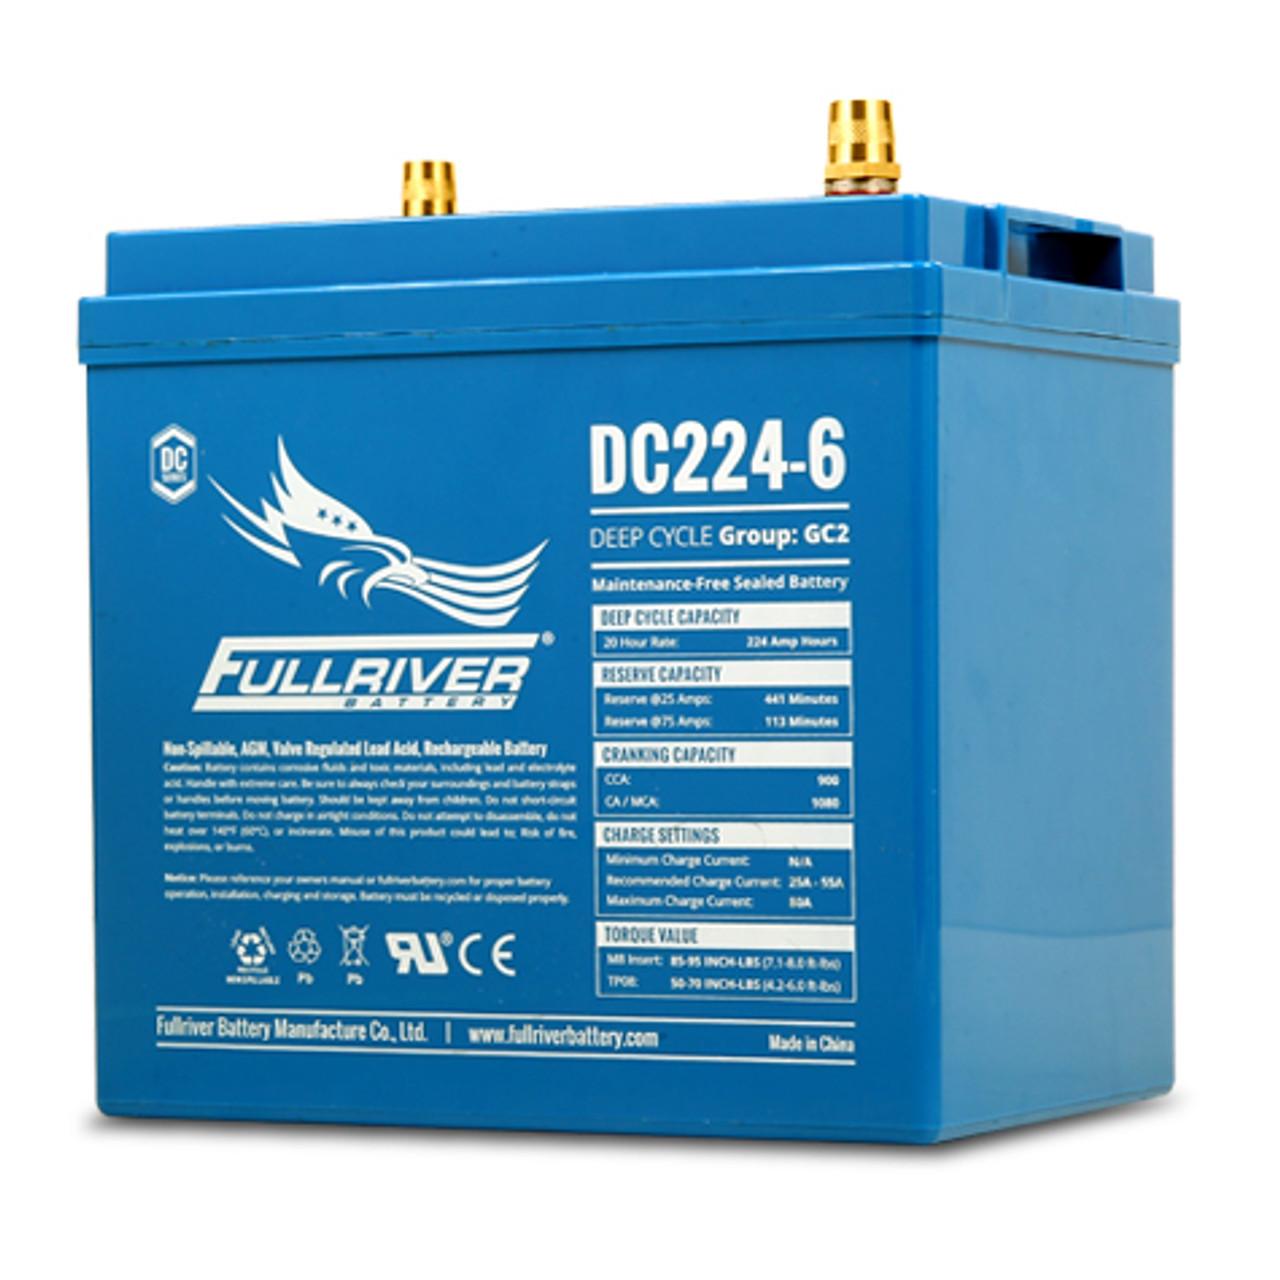 Fullriver DC224-6 Deep Cycle AGM Battery (Size GC2)